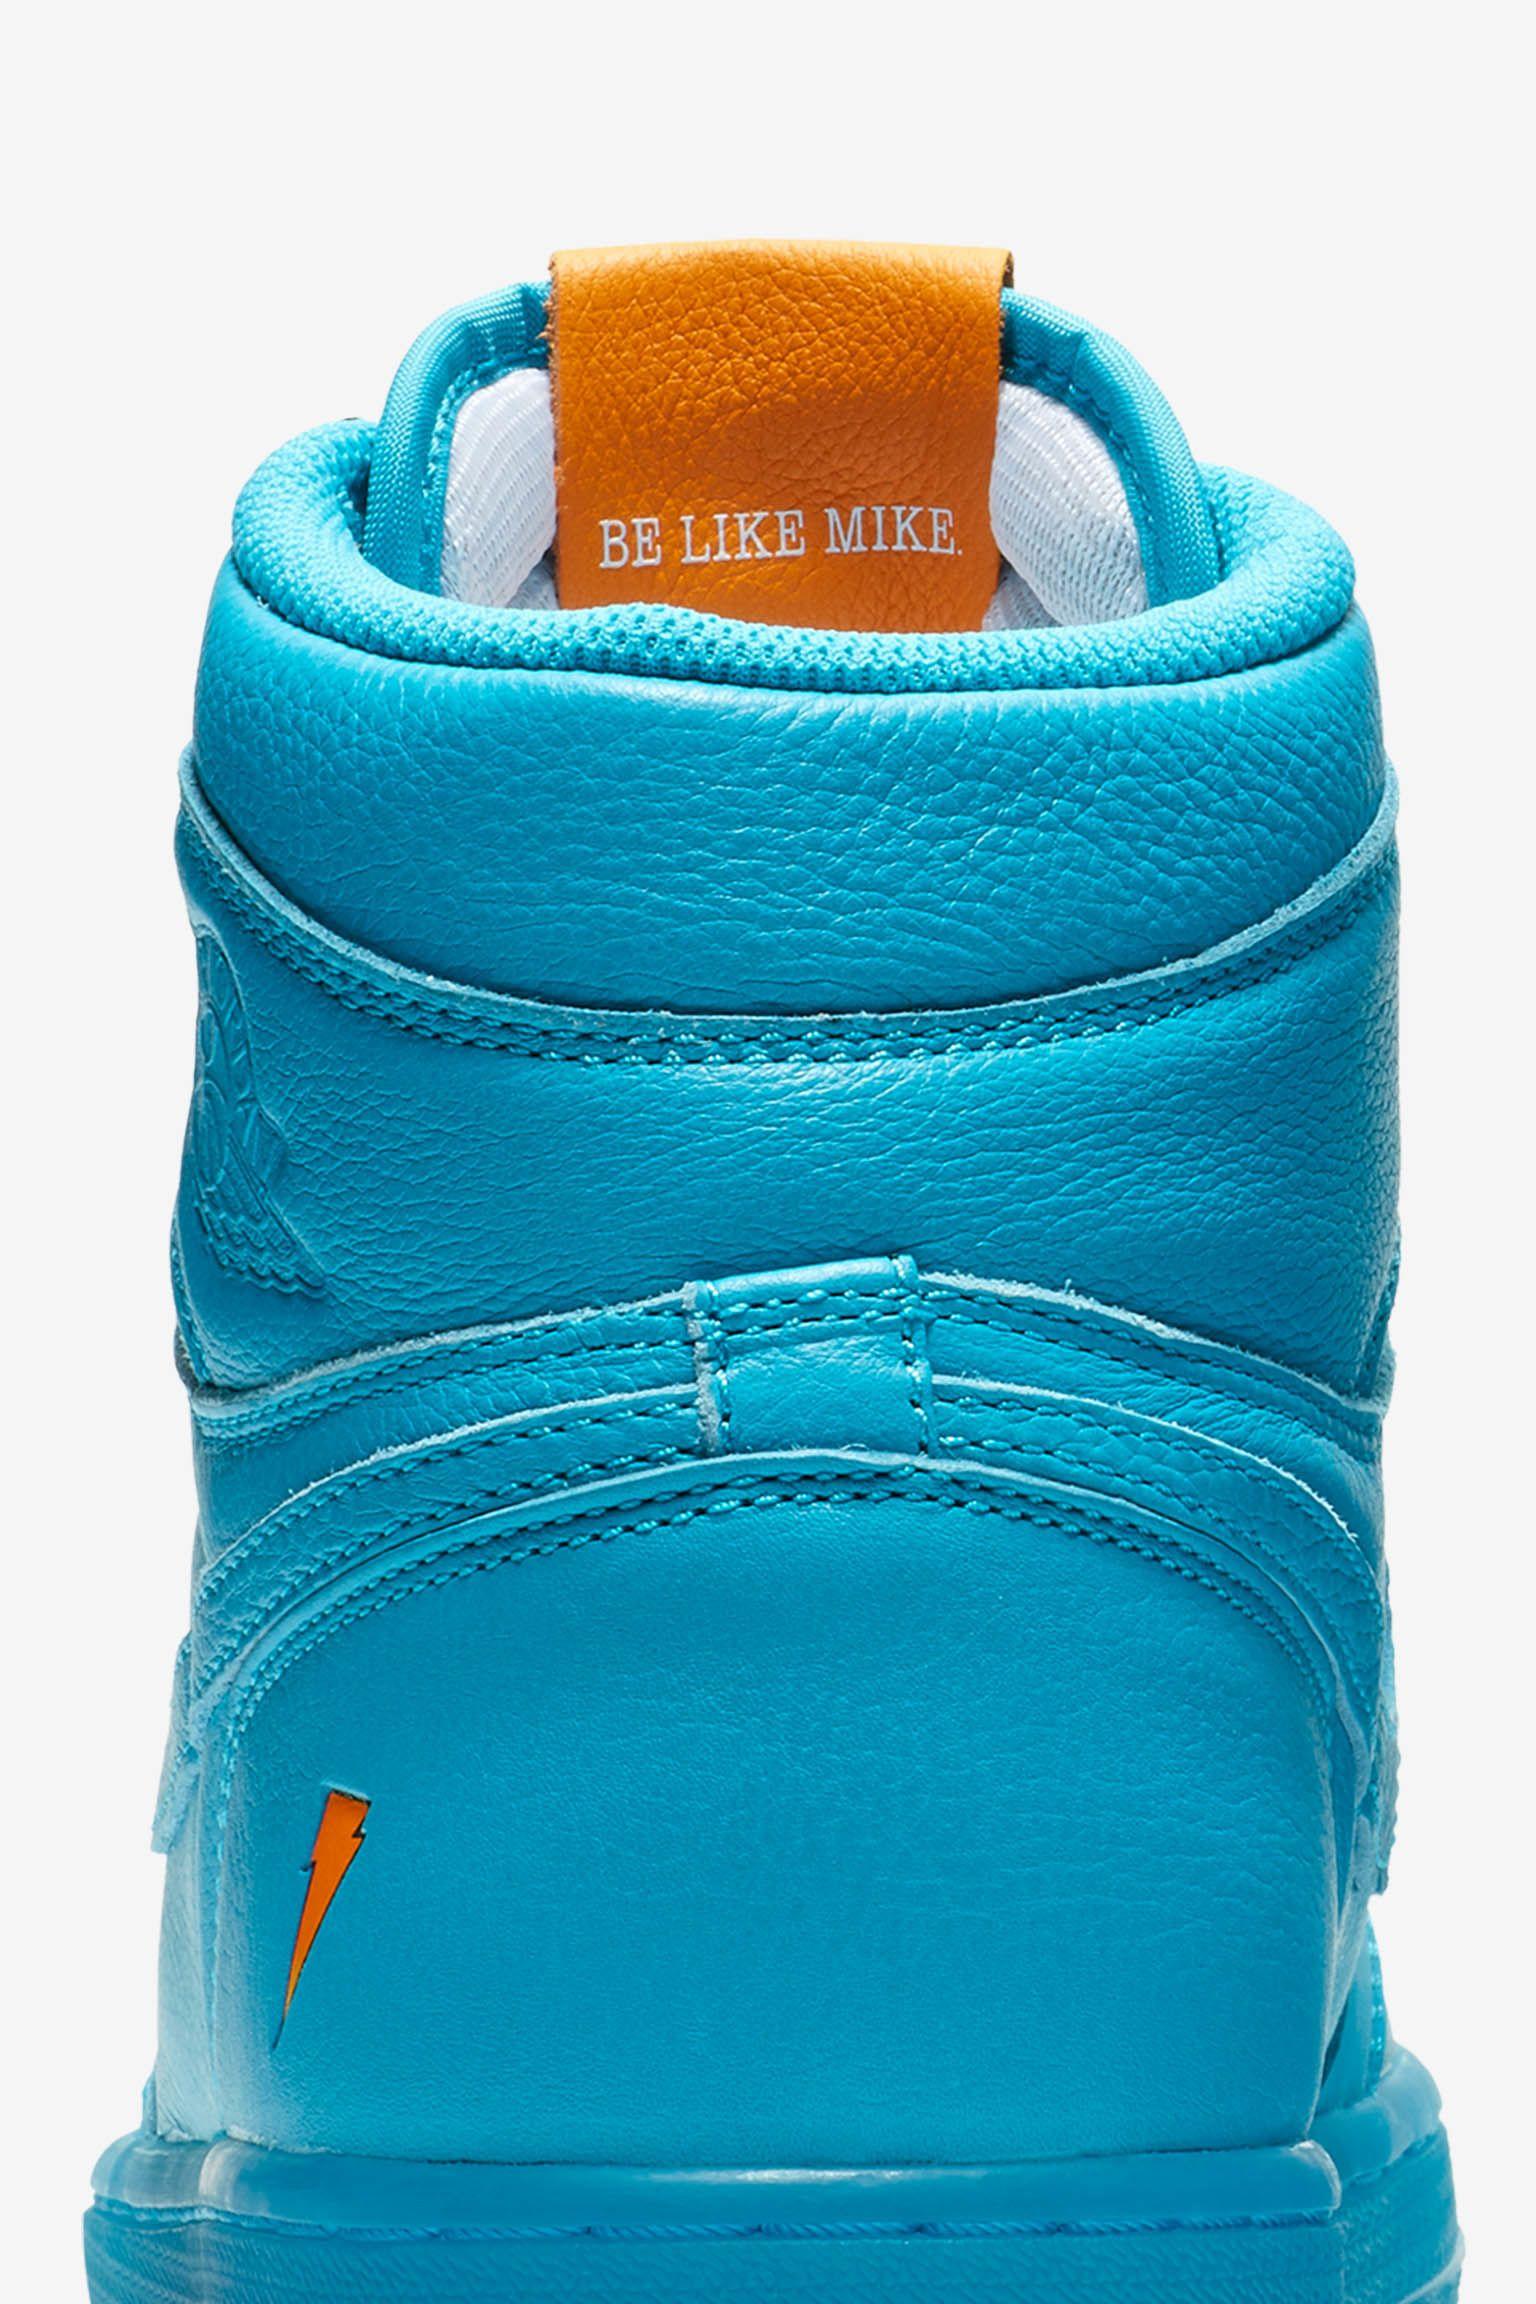 Air Jordan 1 High Gatorade 'Cool Blue' Release Date